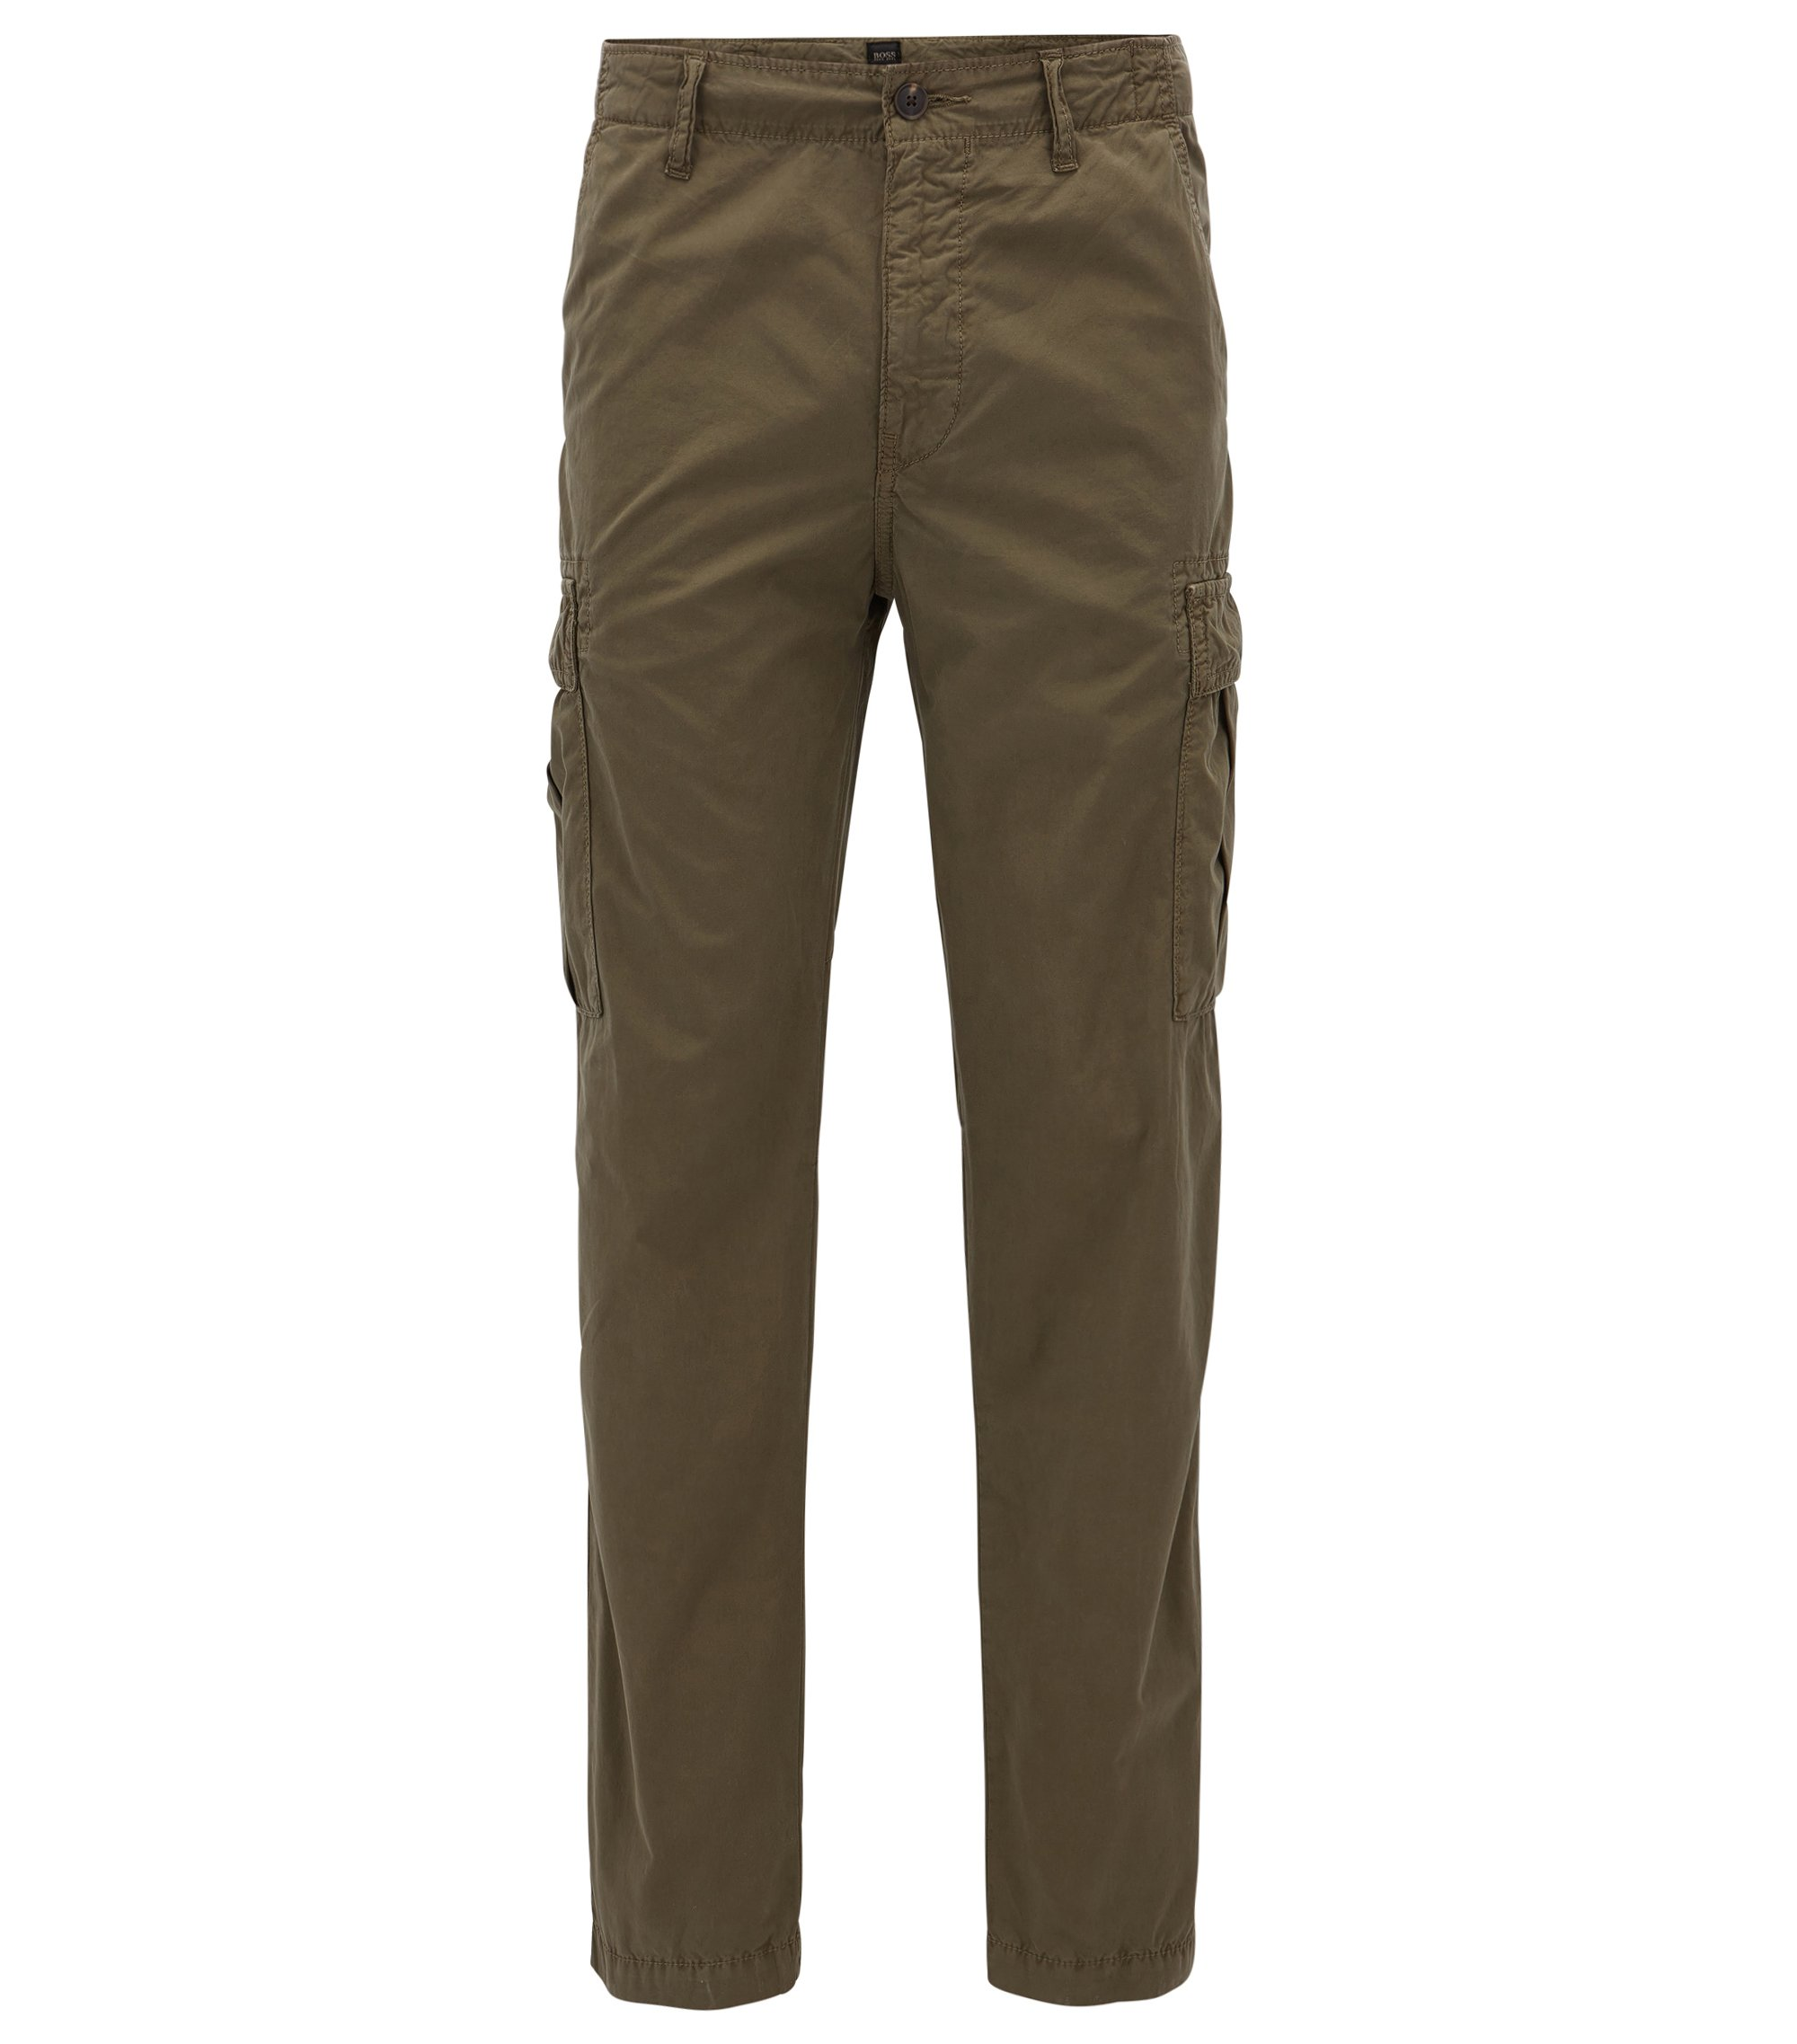 Pantalon cargo Tapered Fit en popeline de coton, Vert sombre